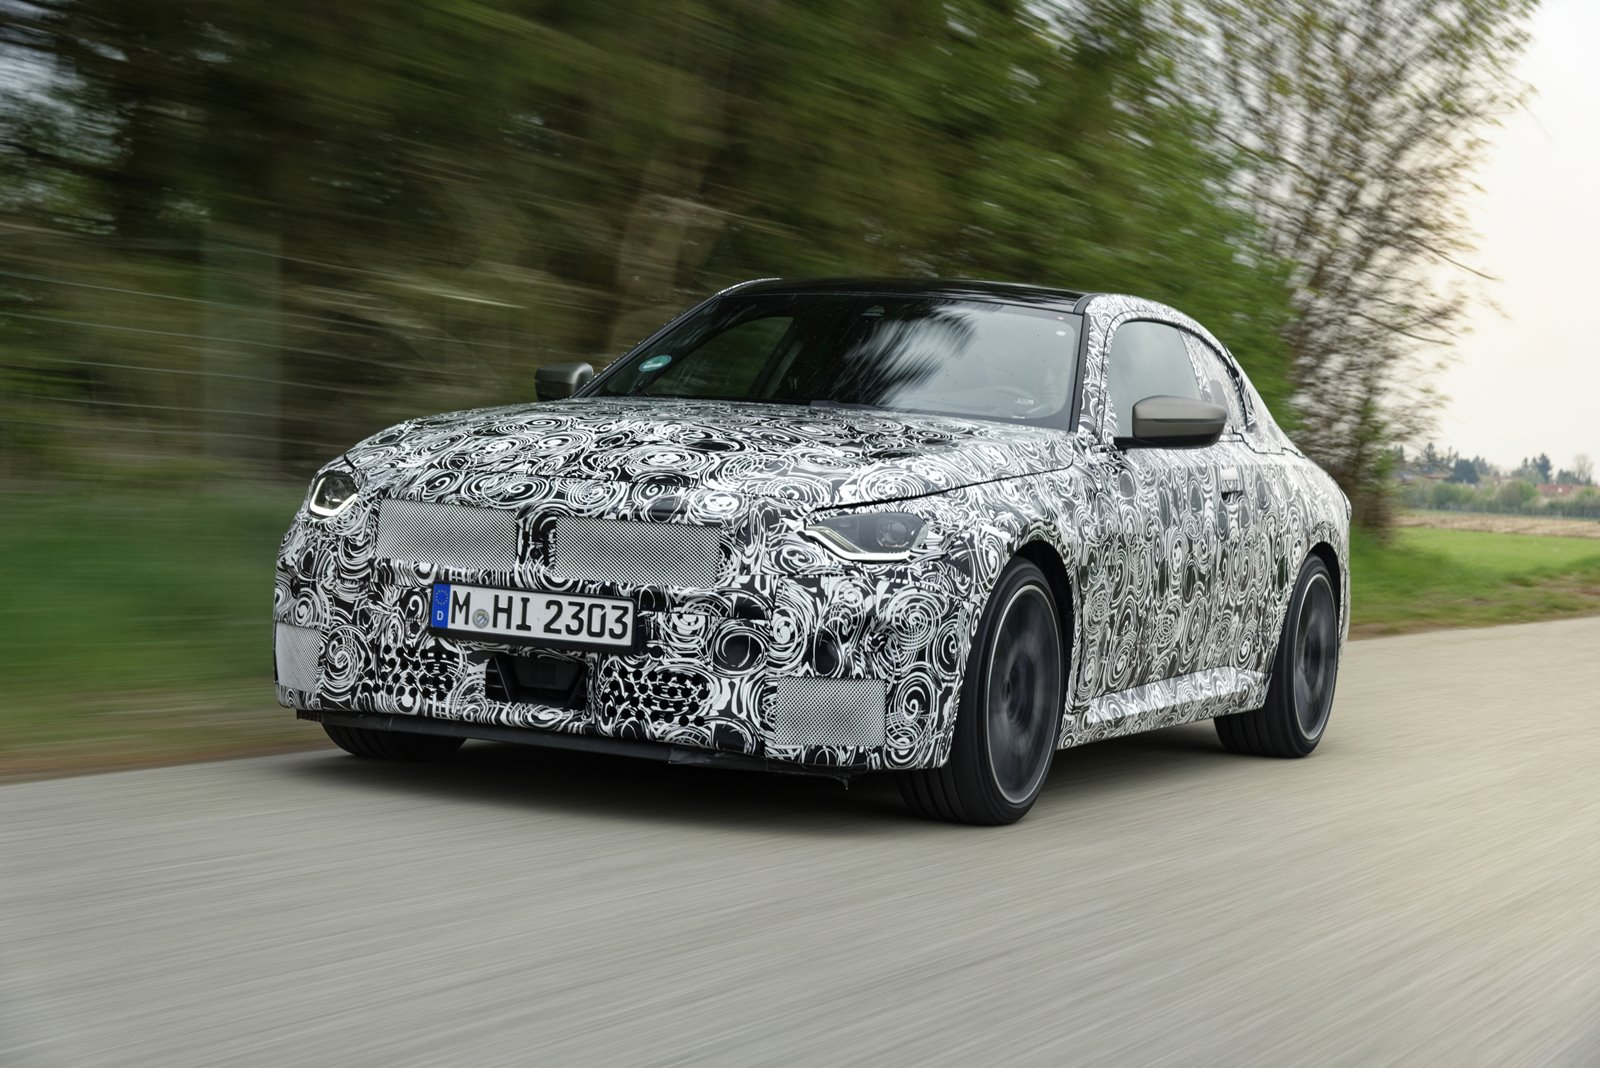 Nuevo BMW Serie 2 Coupé frontal